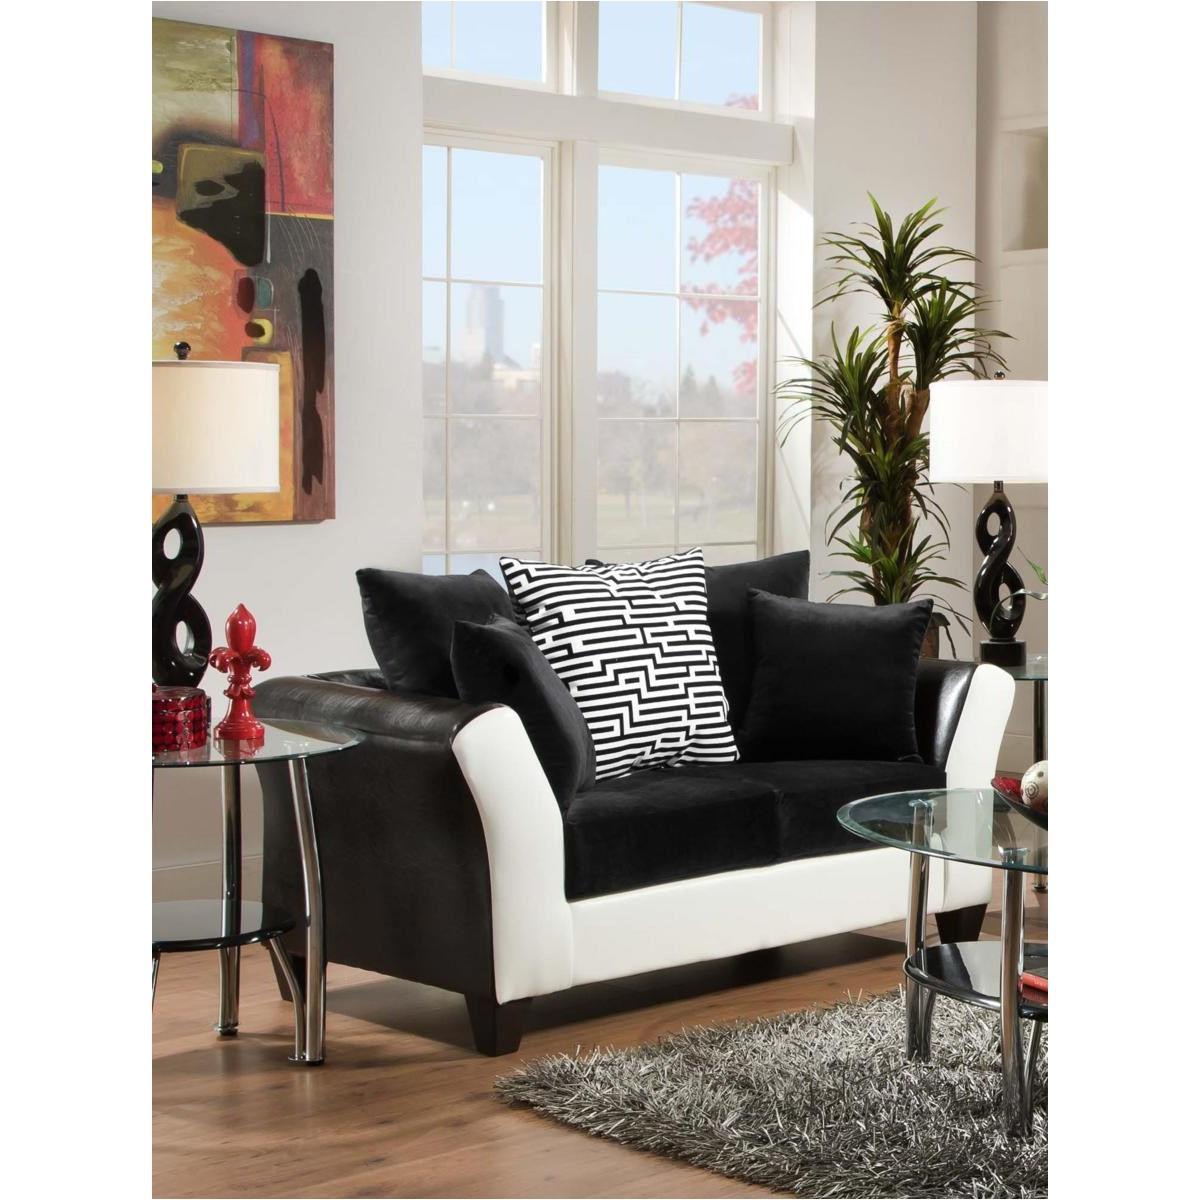 furniture naperville avanti furniture furniture stores in naperville illinois